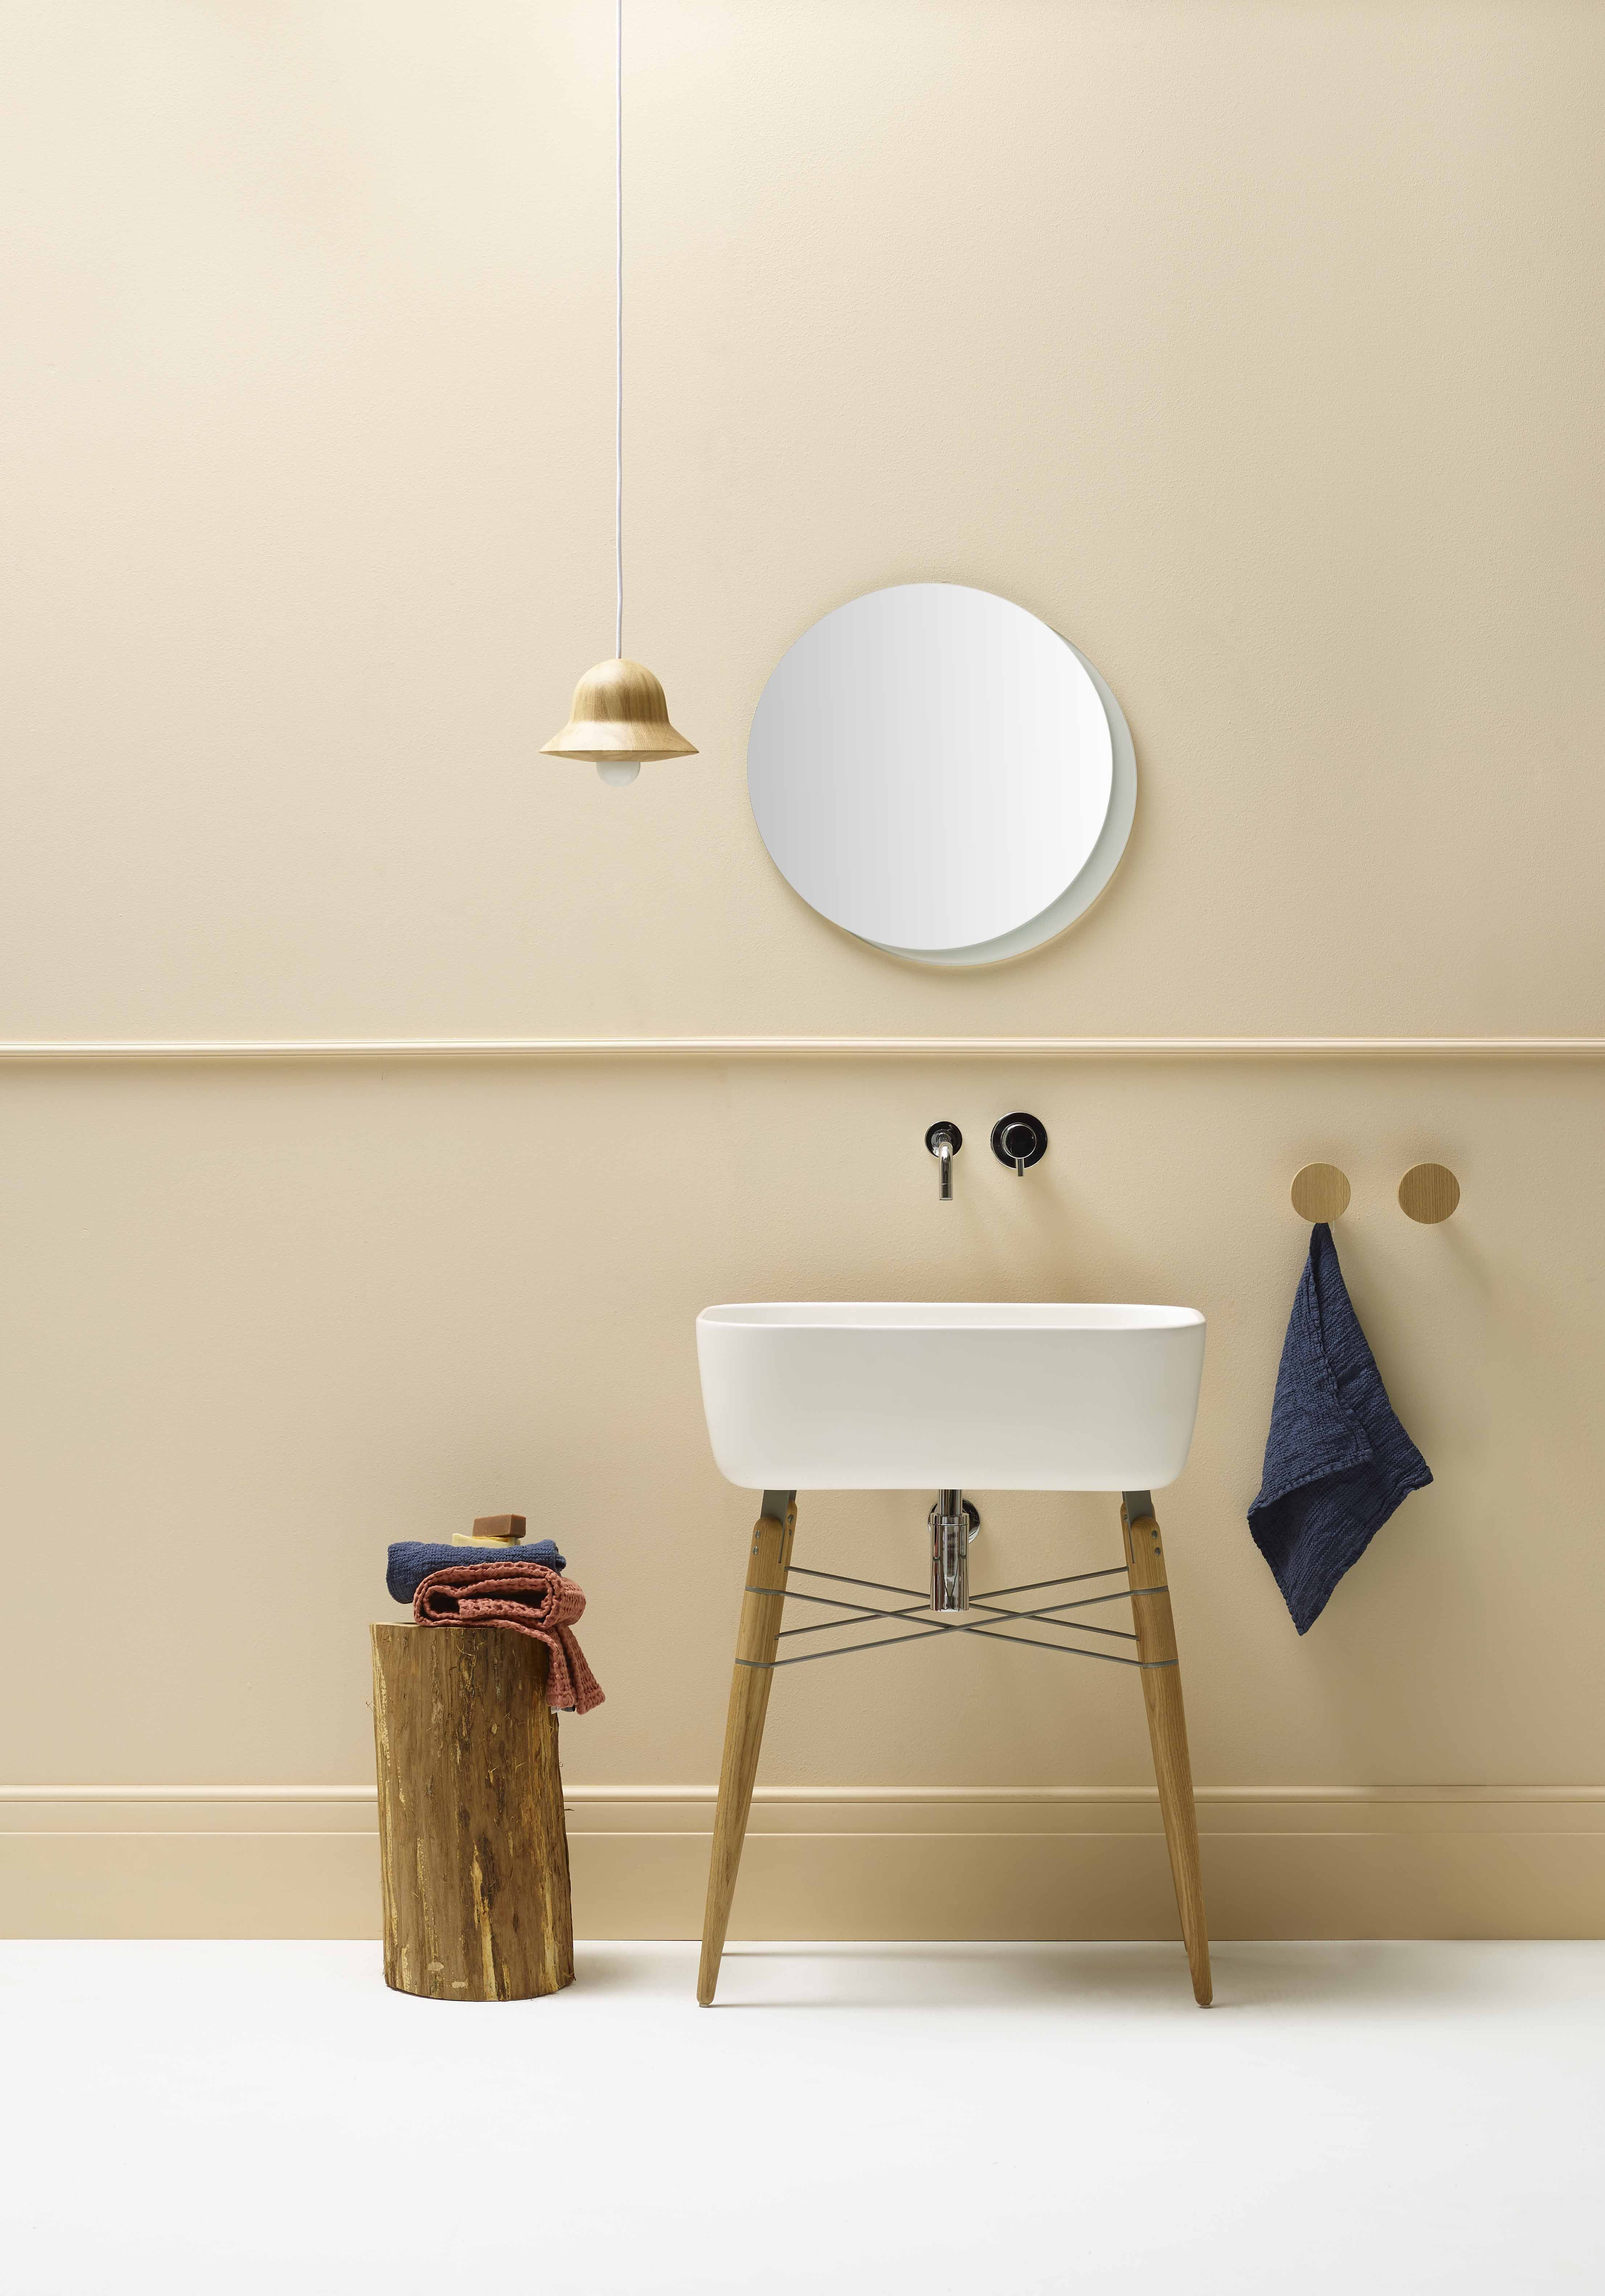 Meuble Salle De Bain Twist Brico Depot ~ Pin By Baumann Pracownia Projektowa On Bathroom Bagno Pinterest